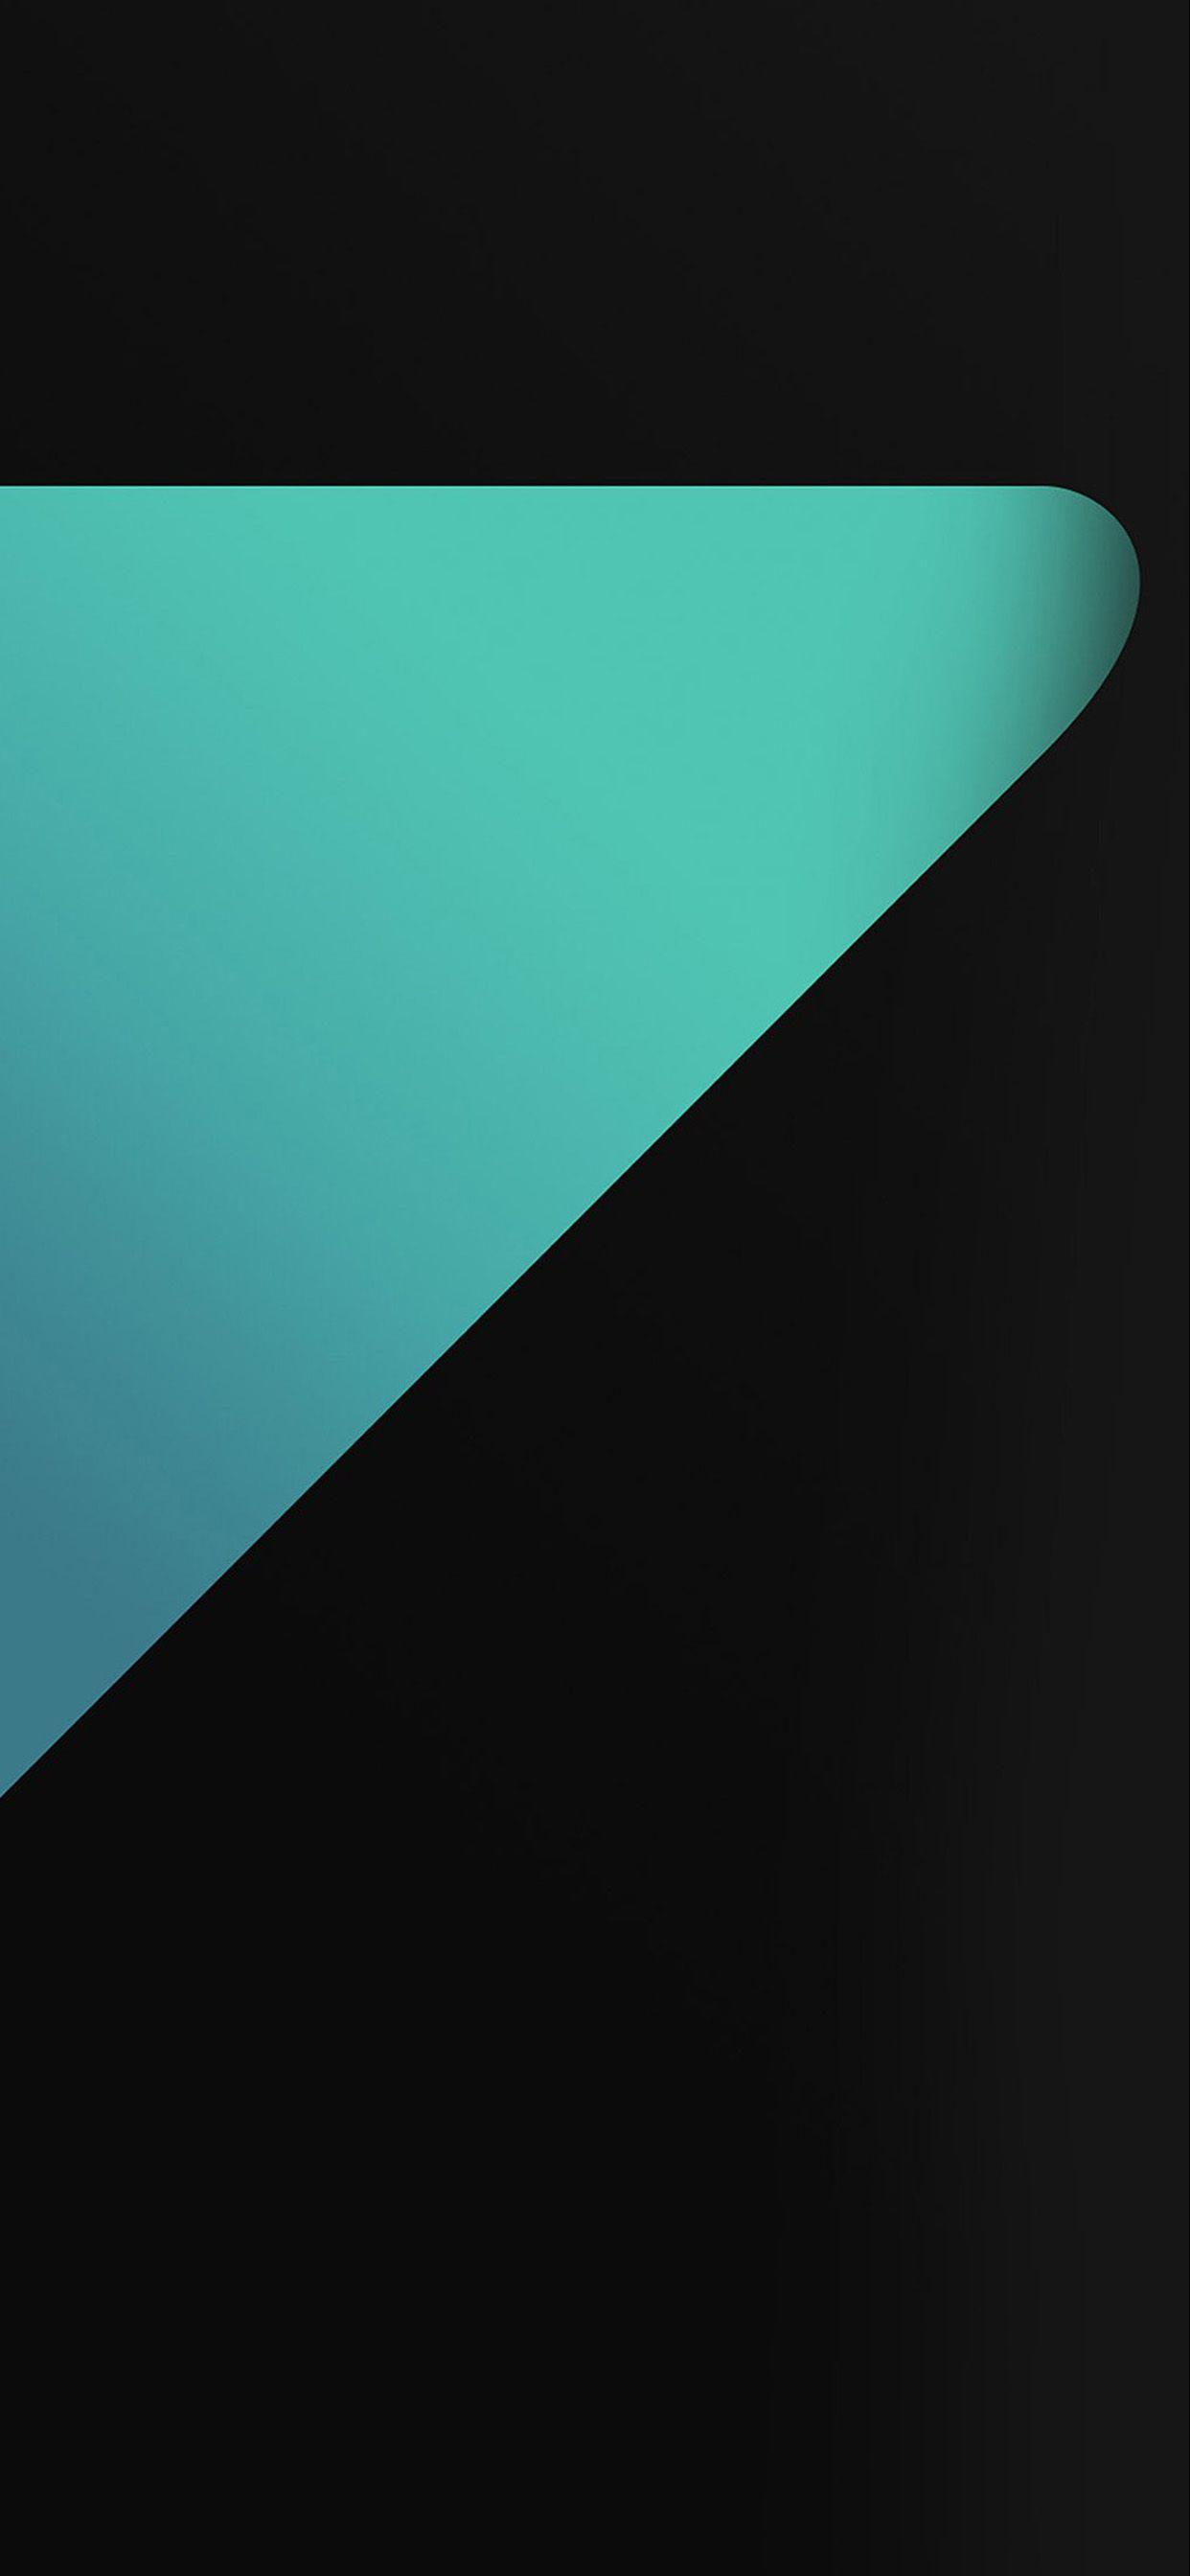 Geometric Iphone Xs Max Wallpaper Geometric Iphone Cool Wallpapers For Phones Hd Wallpaper Iphone